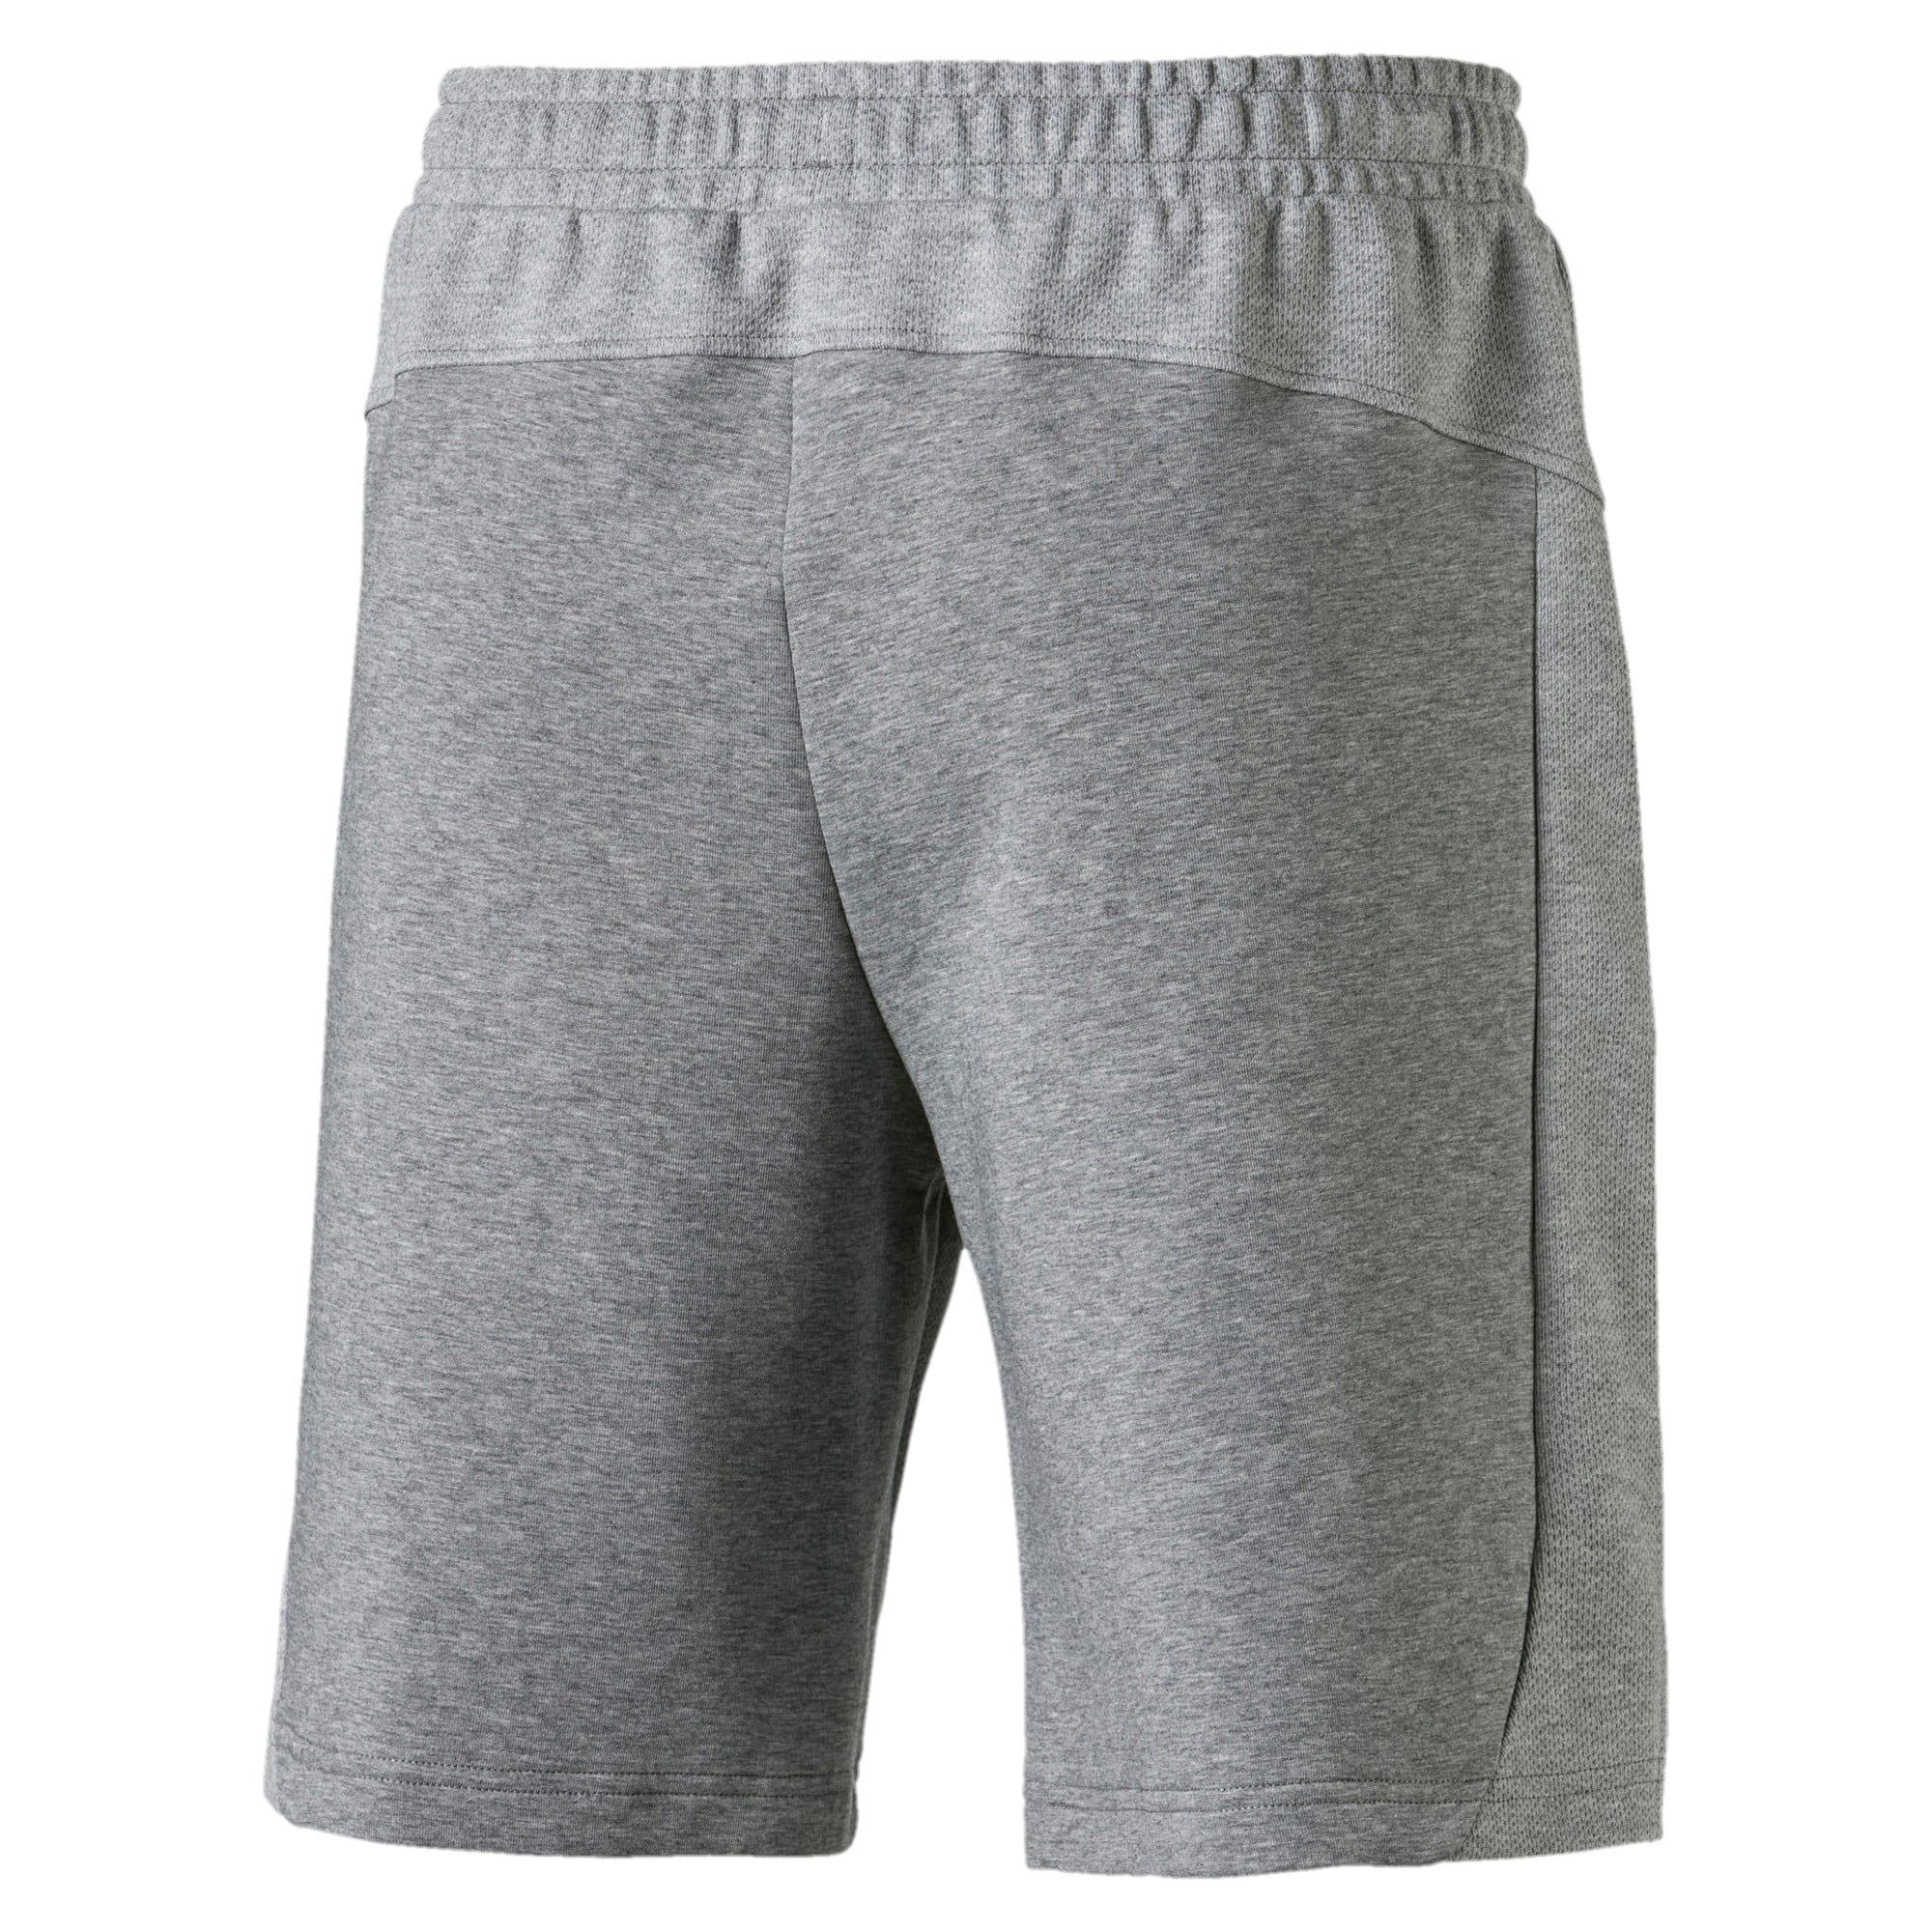 "Thumbnail 5 of Evostripe Move 8"" Men's Shorts, Medium Gray Heather, medium"